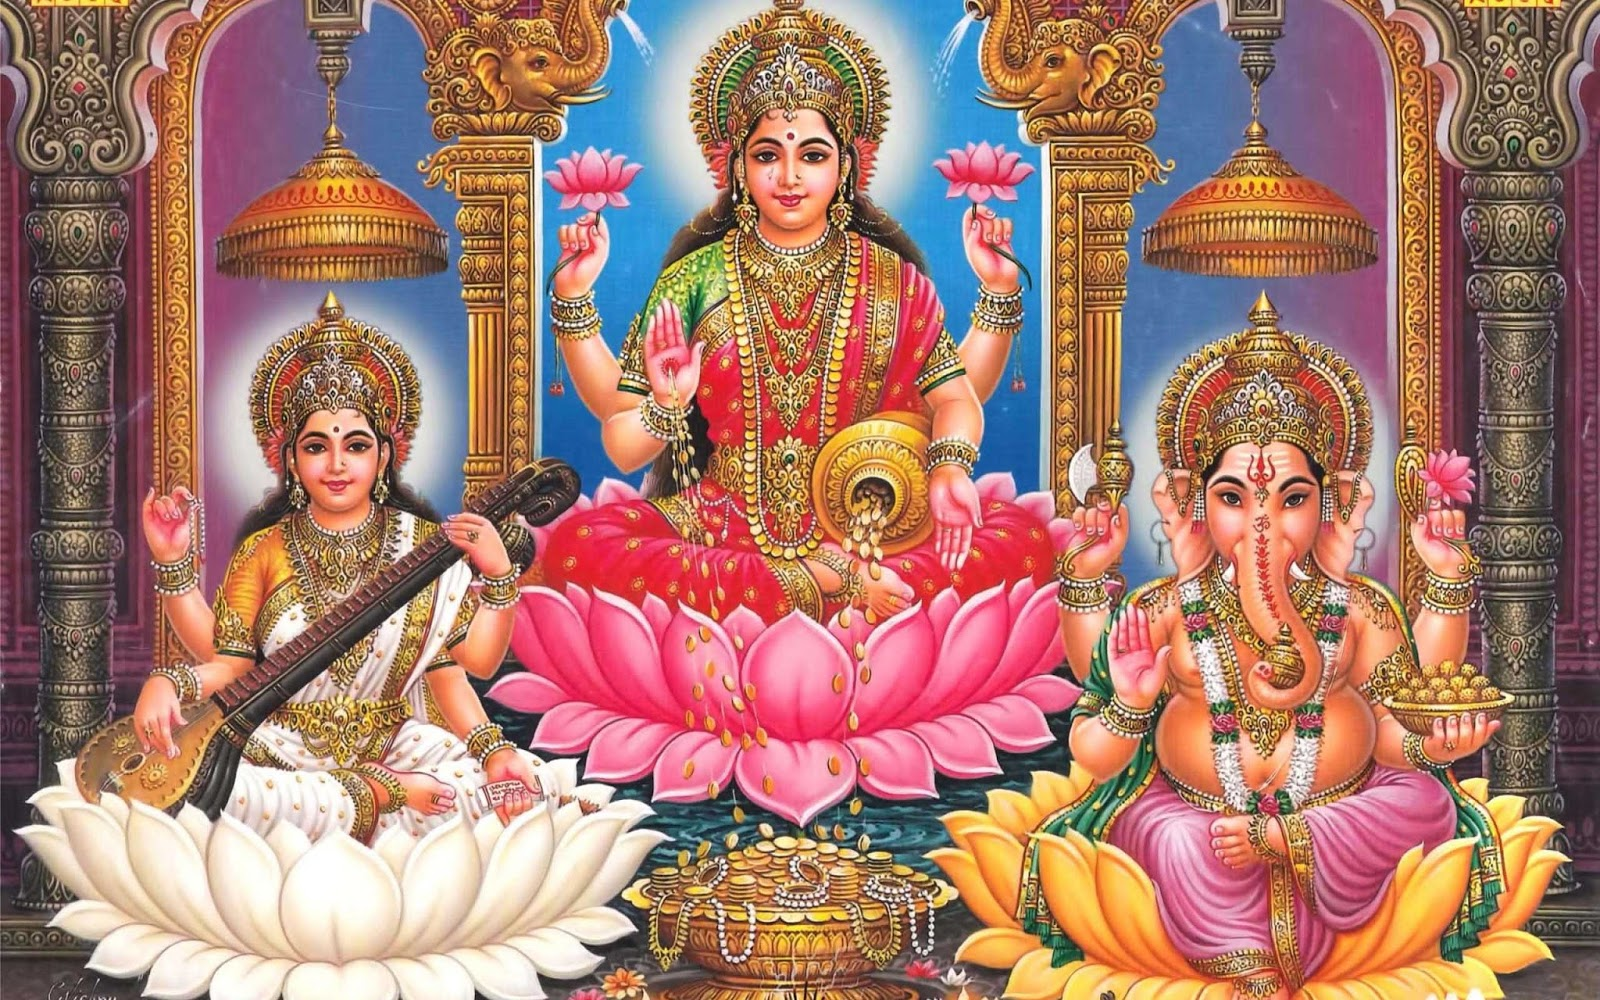 3d Wallpaper For Home Wall India All God Stuff Happy Diwali Laxmi Ganesh Wallpaper 2015